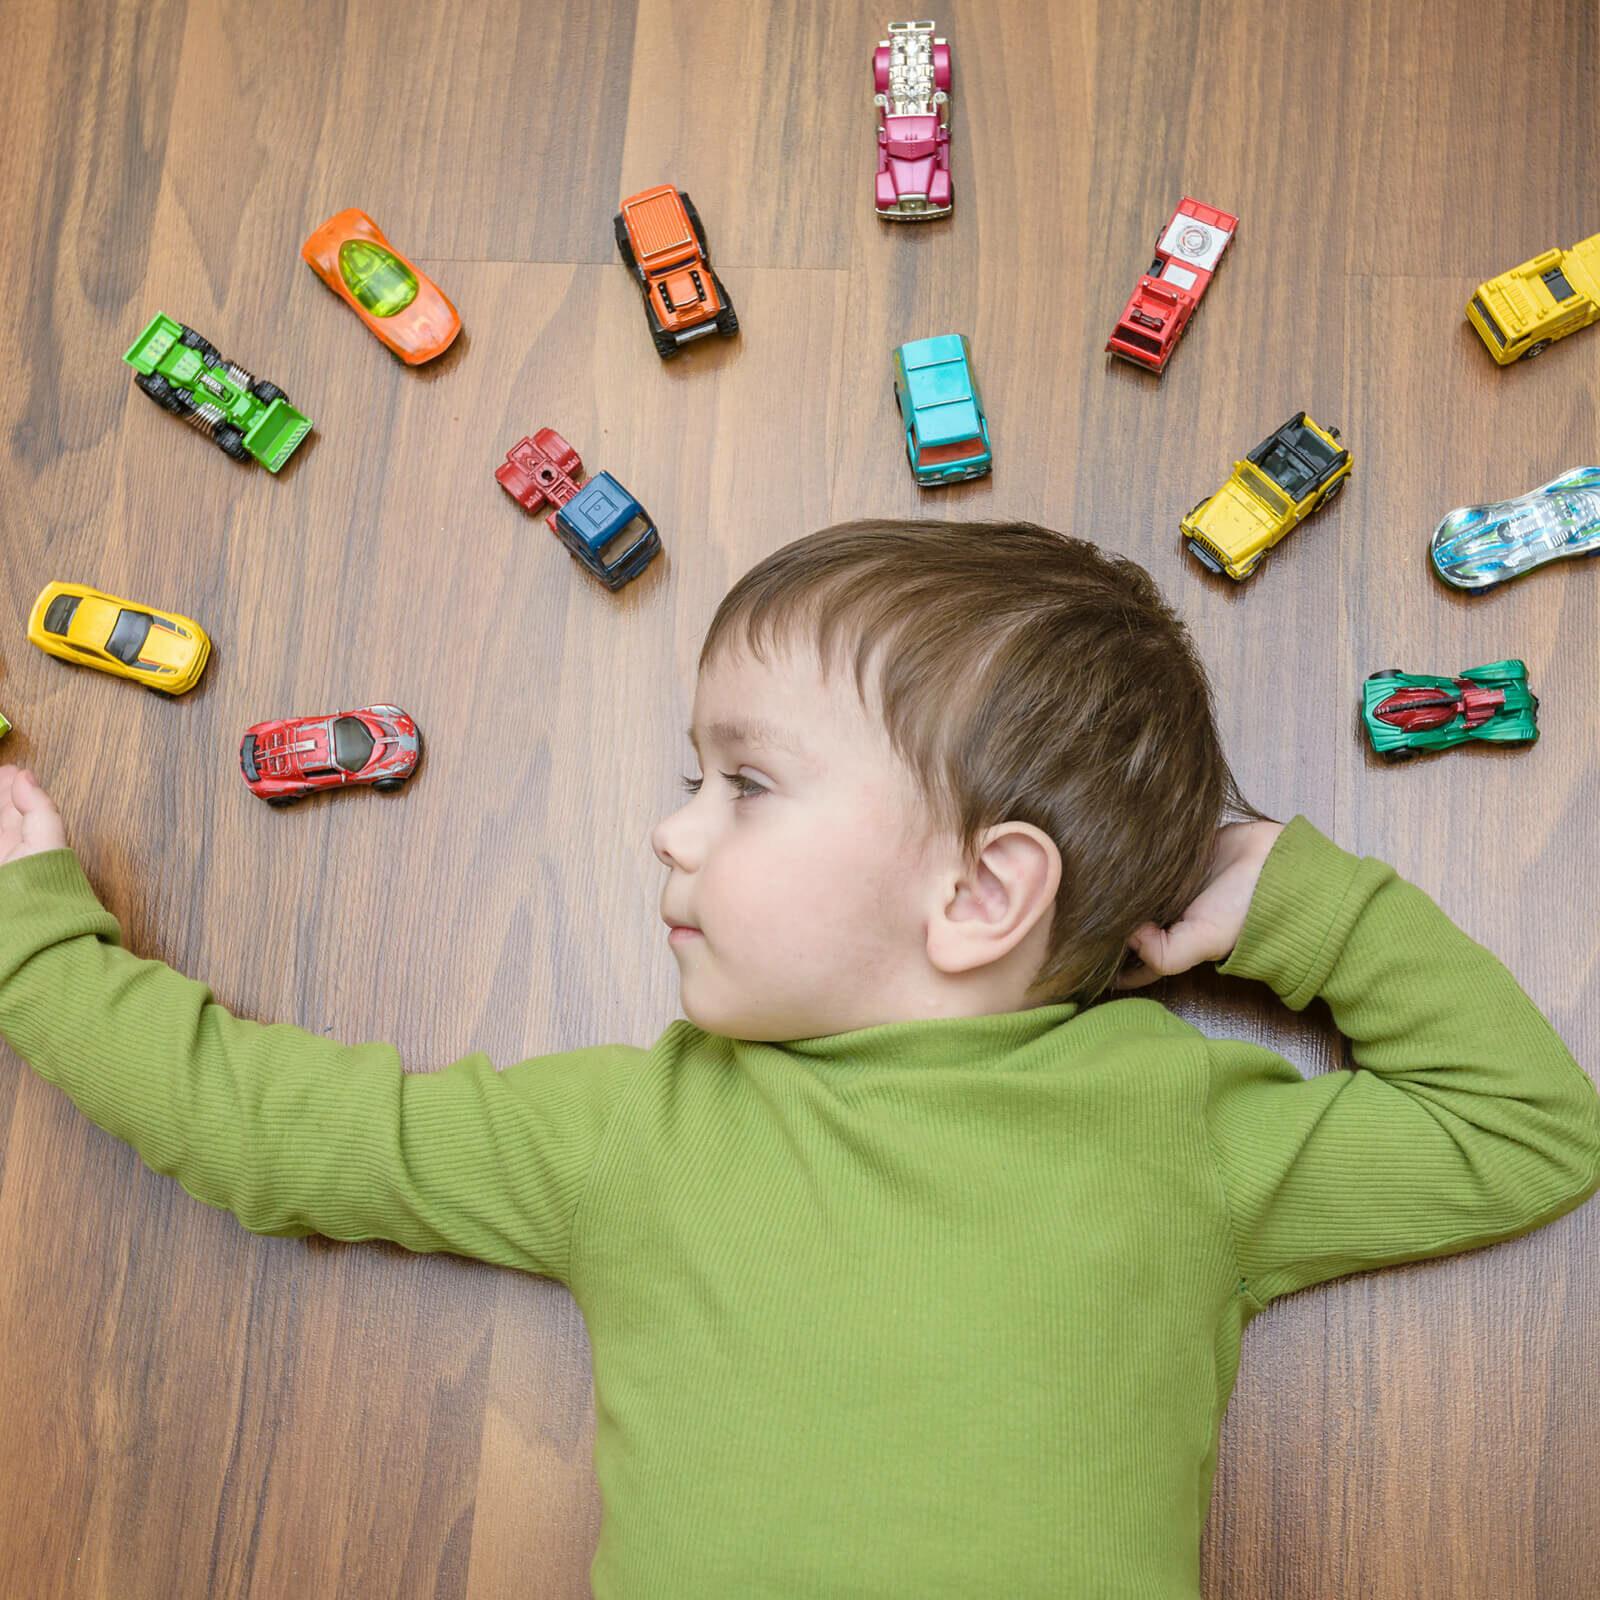 Kid with toy cars on vinyl floor | Flooring 101